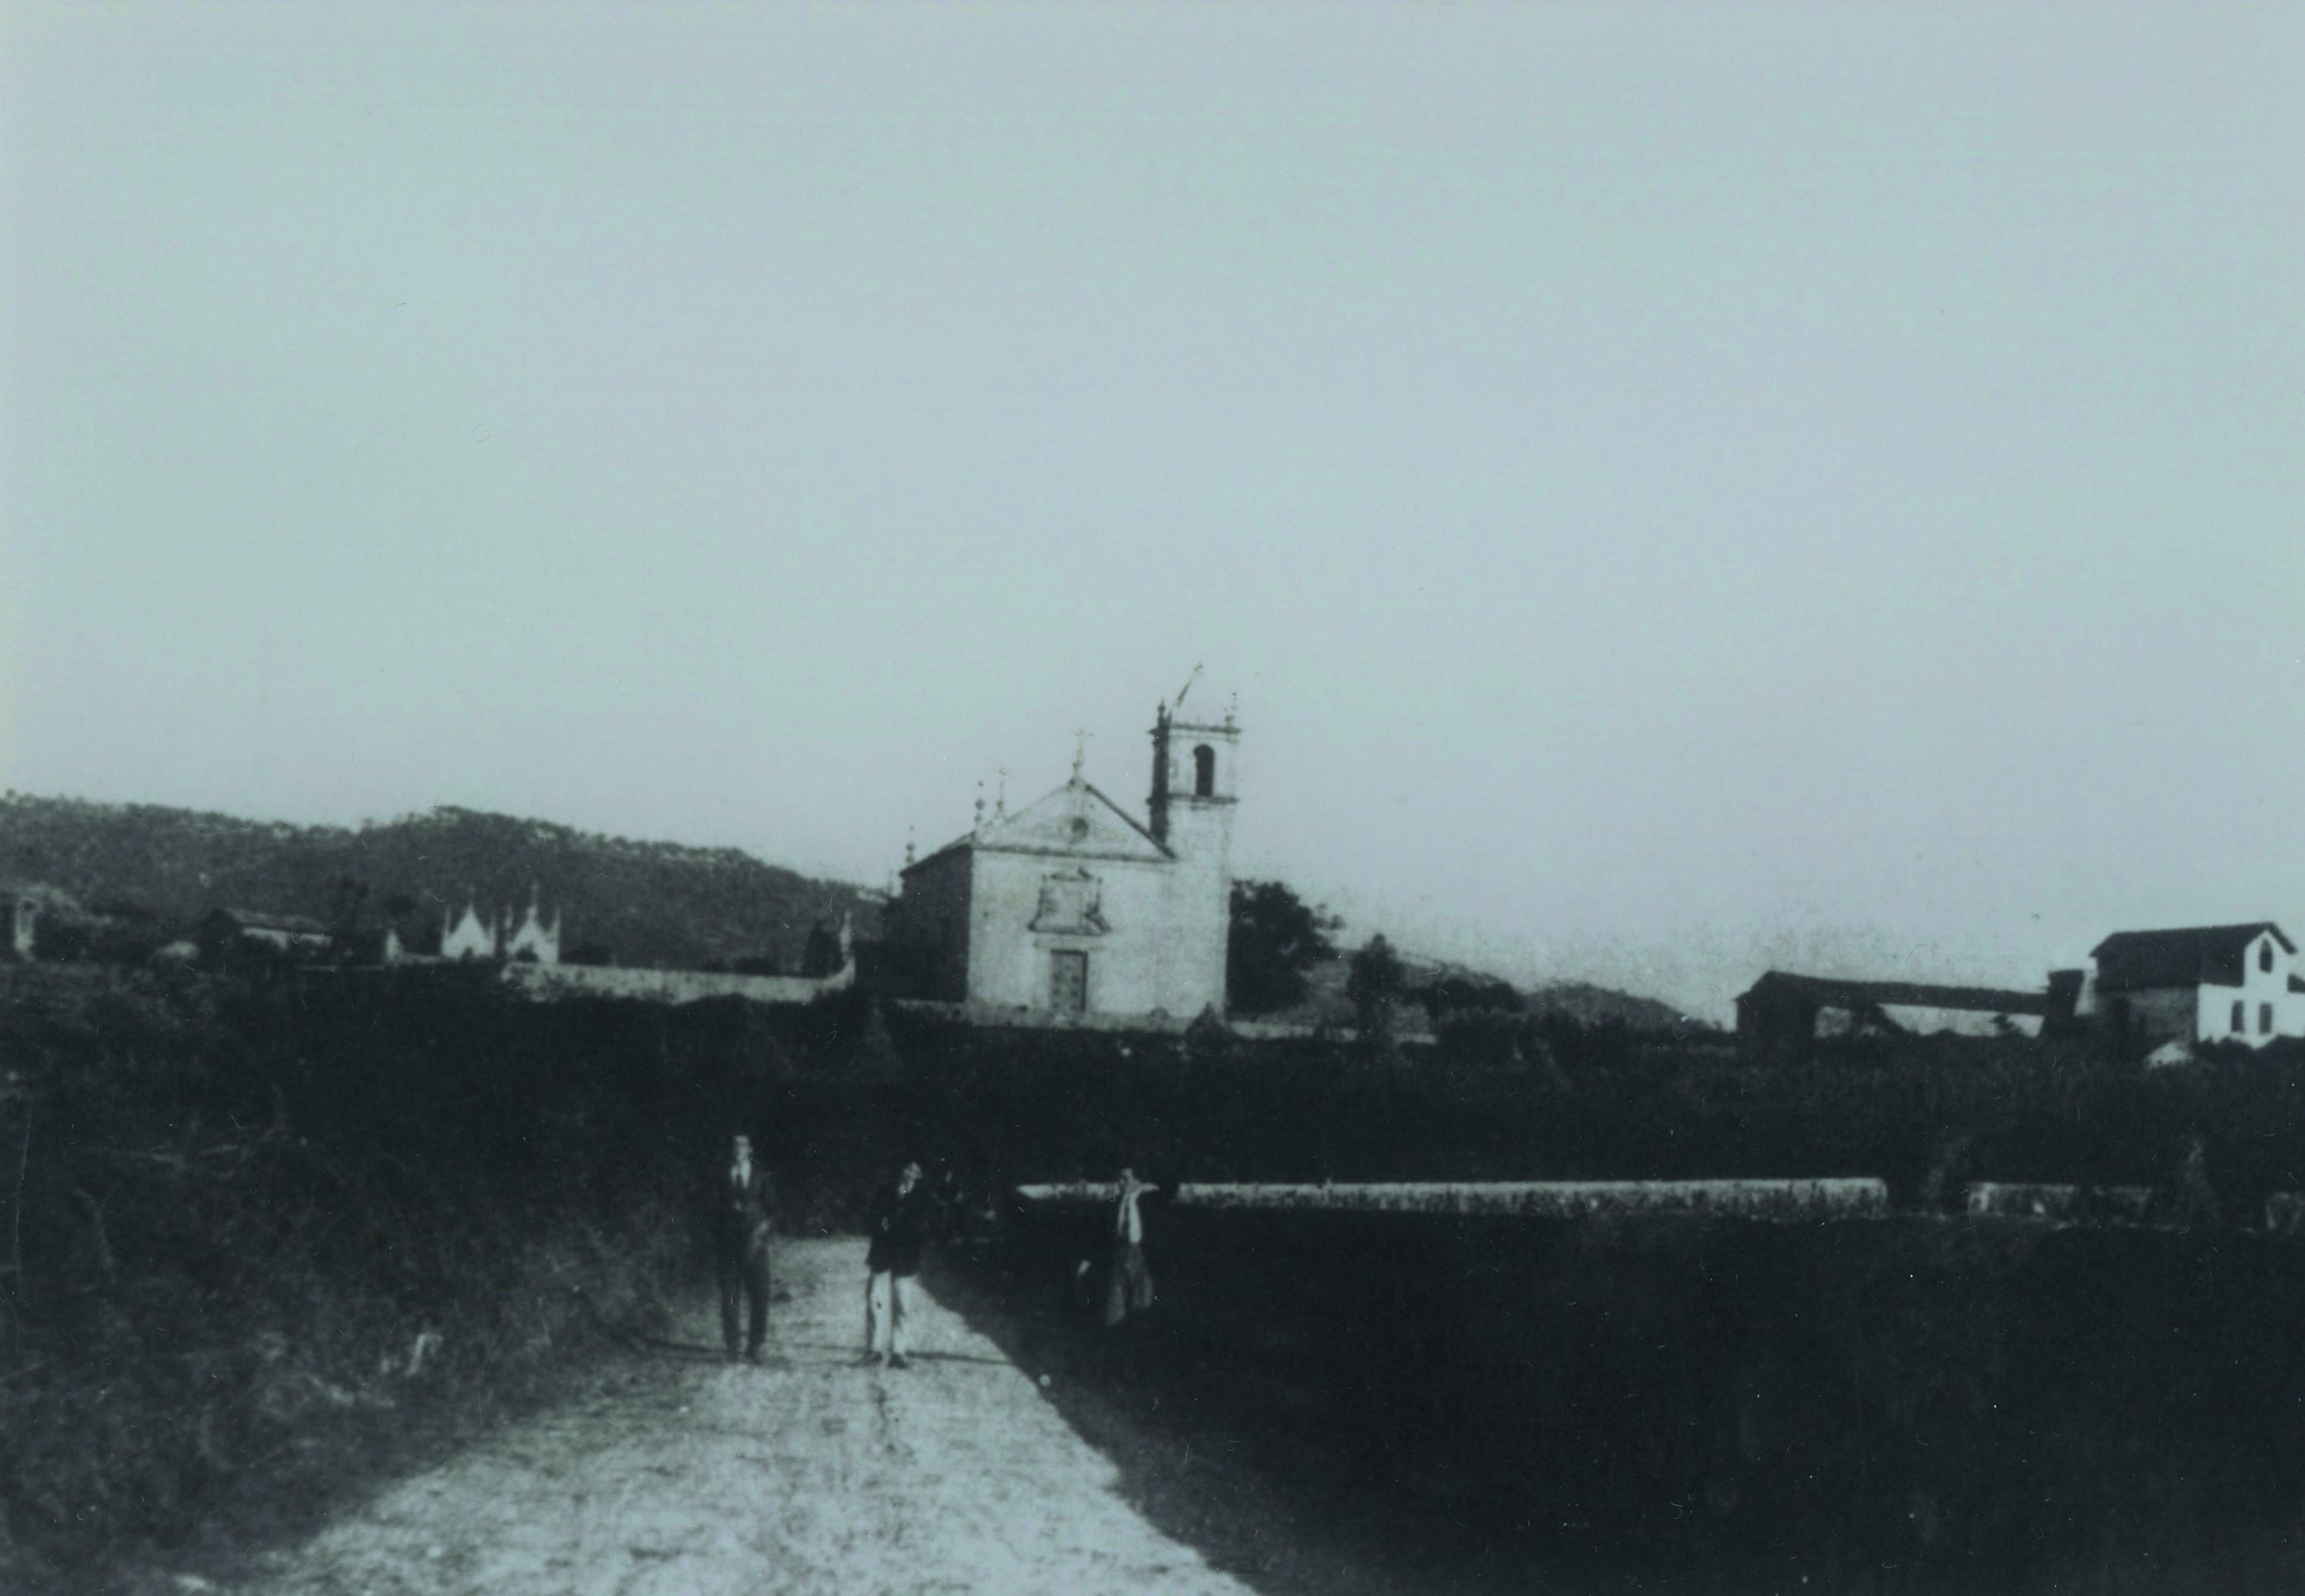 Igreja, Nogueira do Cravo (1920)